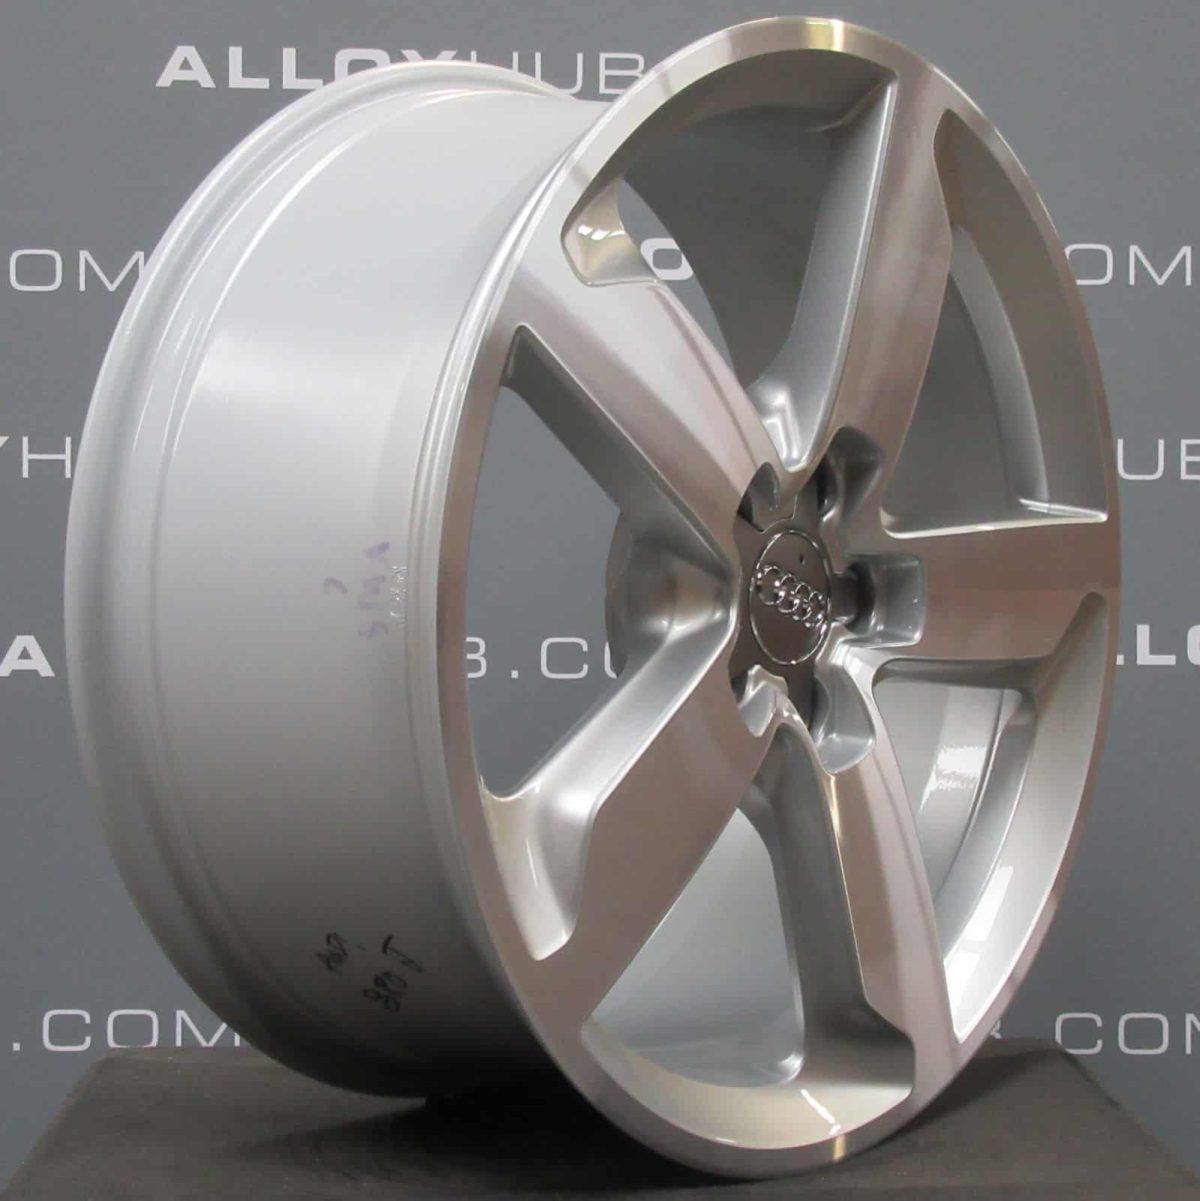 "Genuine Audi Q5 5 Spoke 19"" Inch Alloy Wheels with Diamond Turned & Silver Finish 8R0 601 025 J"